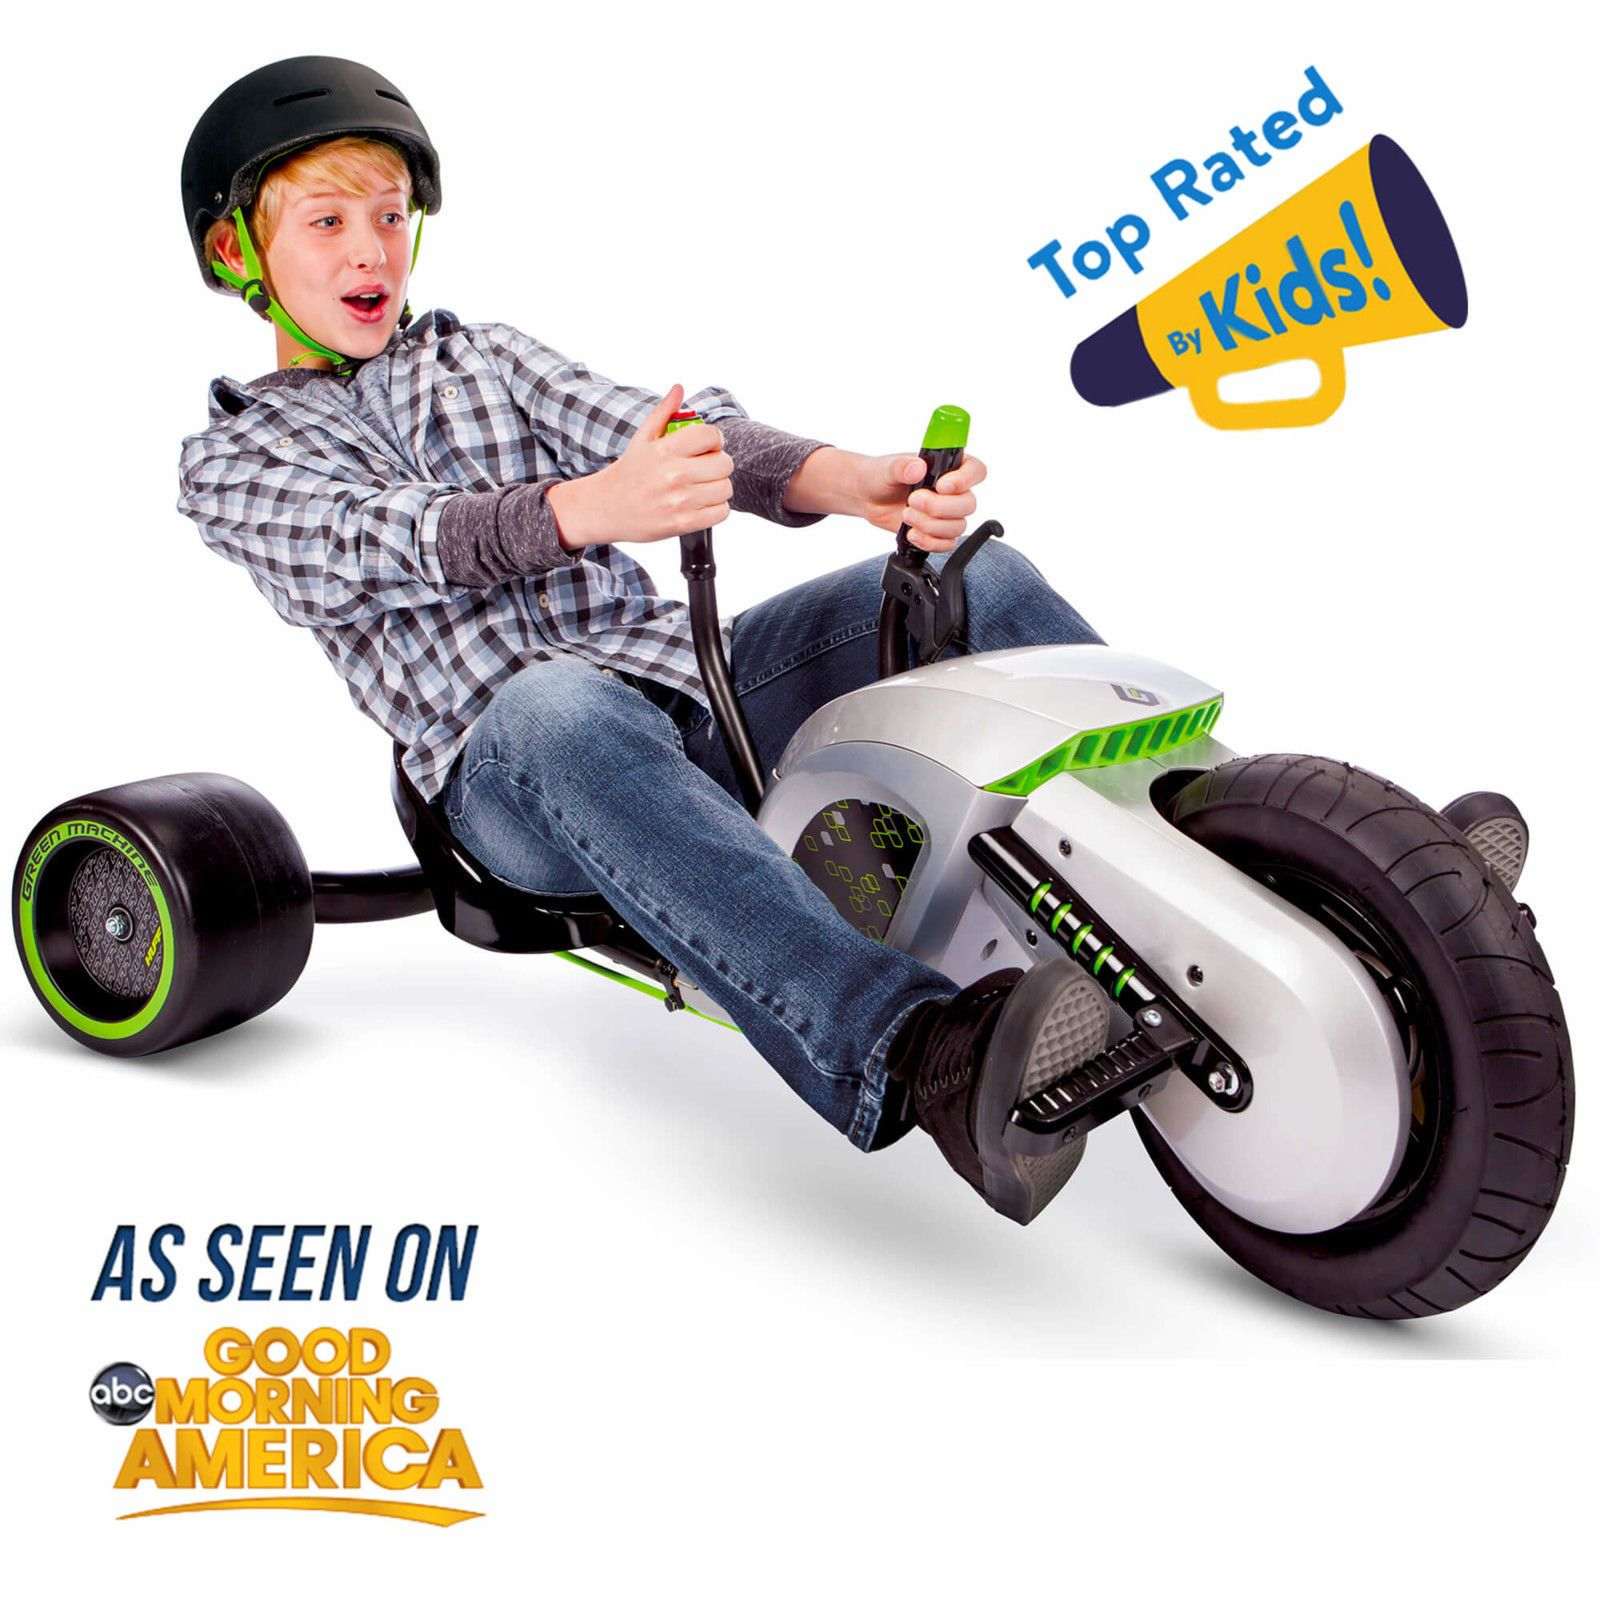 Ride On Trike Riding Kids Toys Electric Green Machine 24